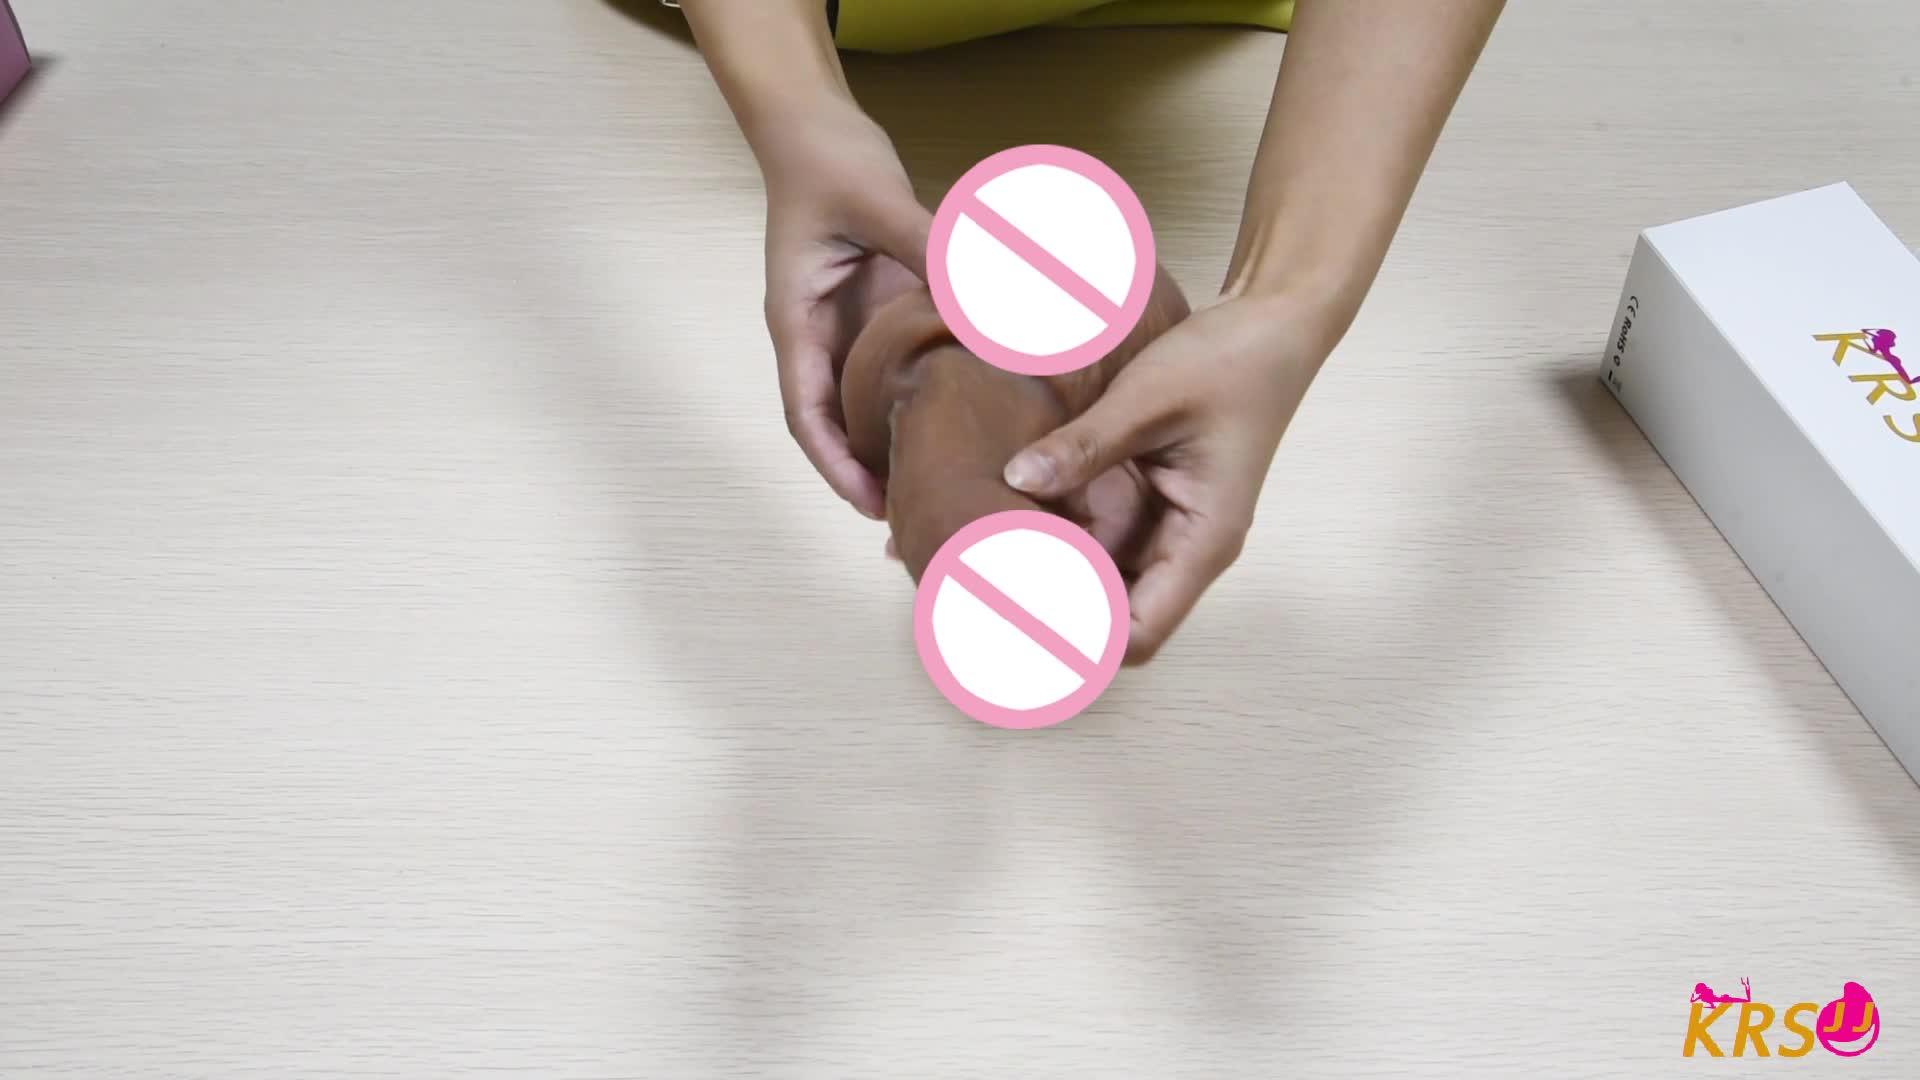 Strap On Liquid Artificial Realistic Silicone Penis Big Soft Plastic Dildo